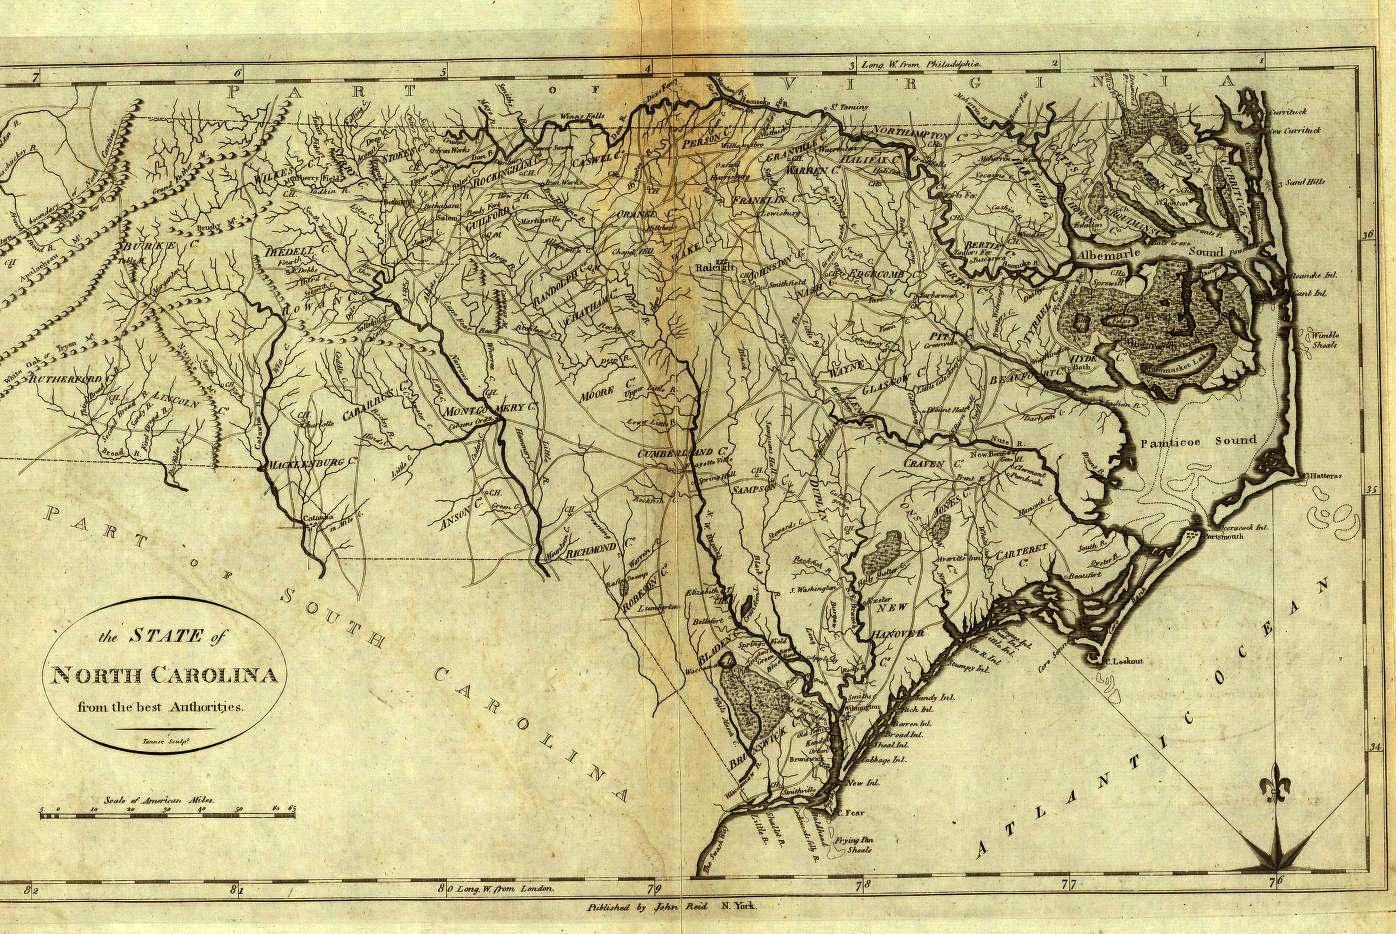 1800 Map of North Carolina - English